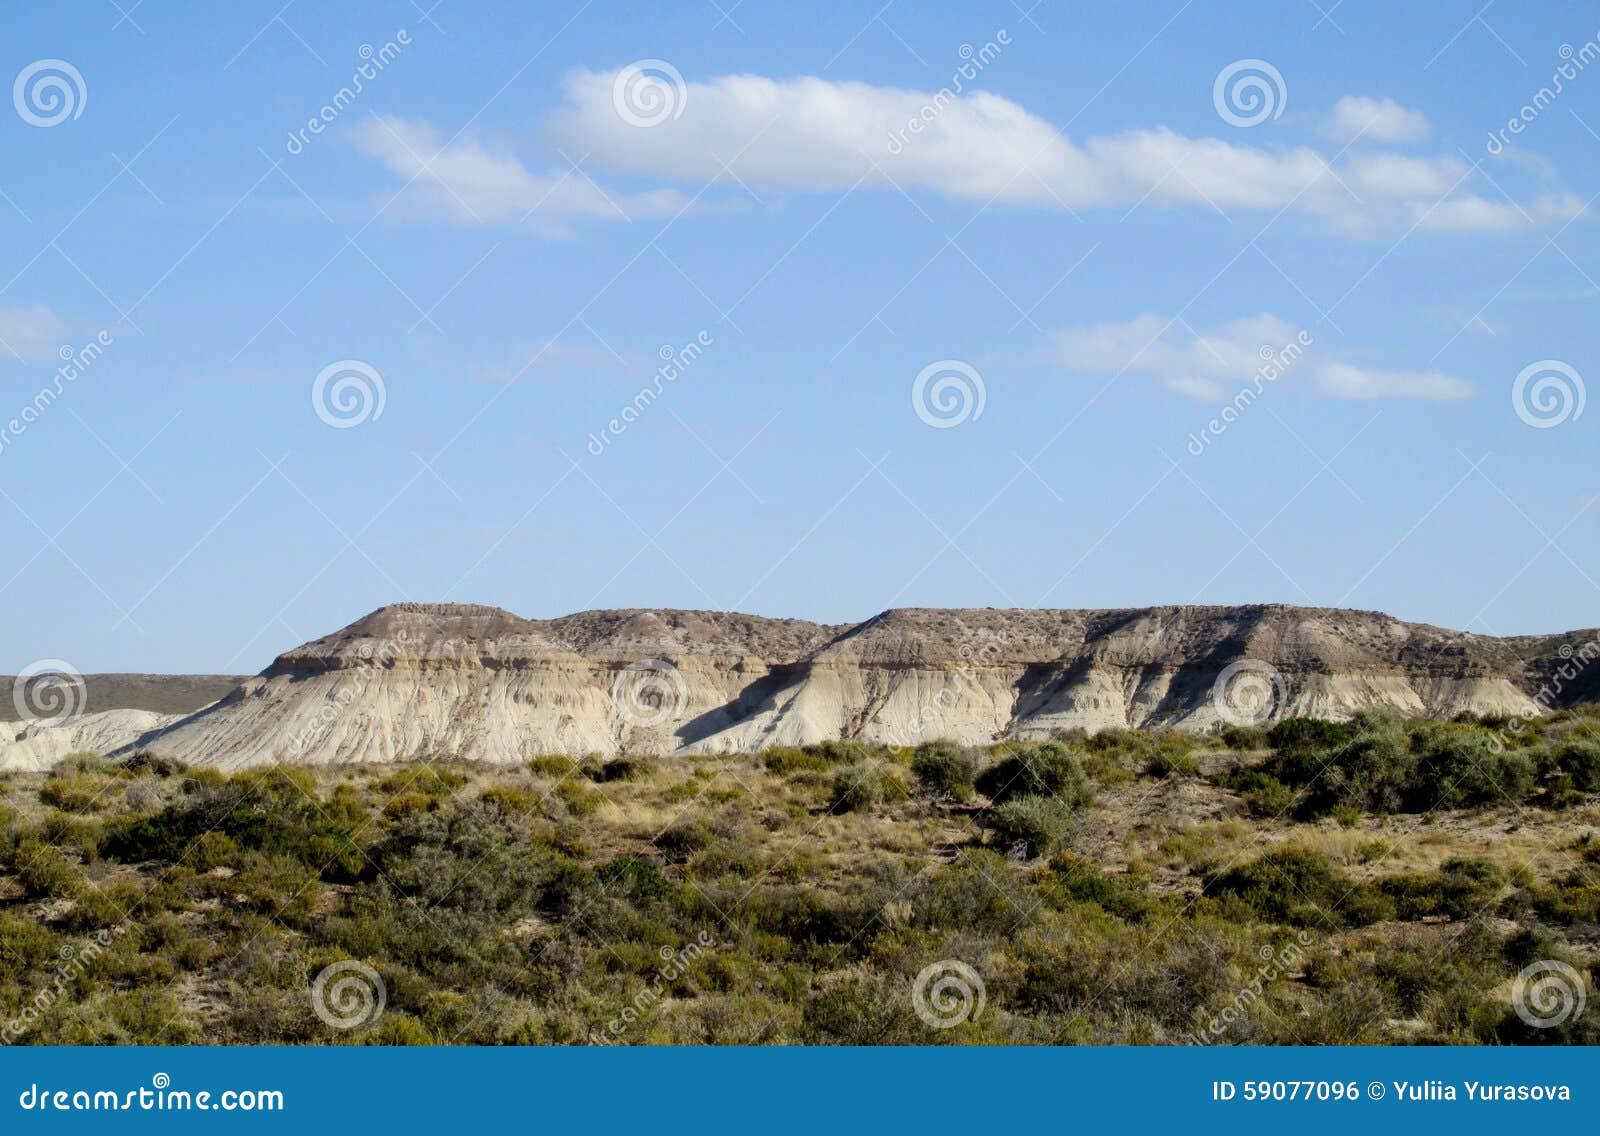 Arbusto do deserto e penhasco branco no litoral